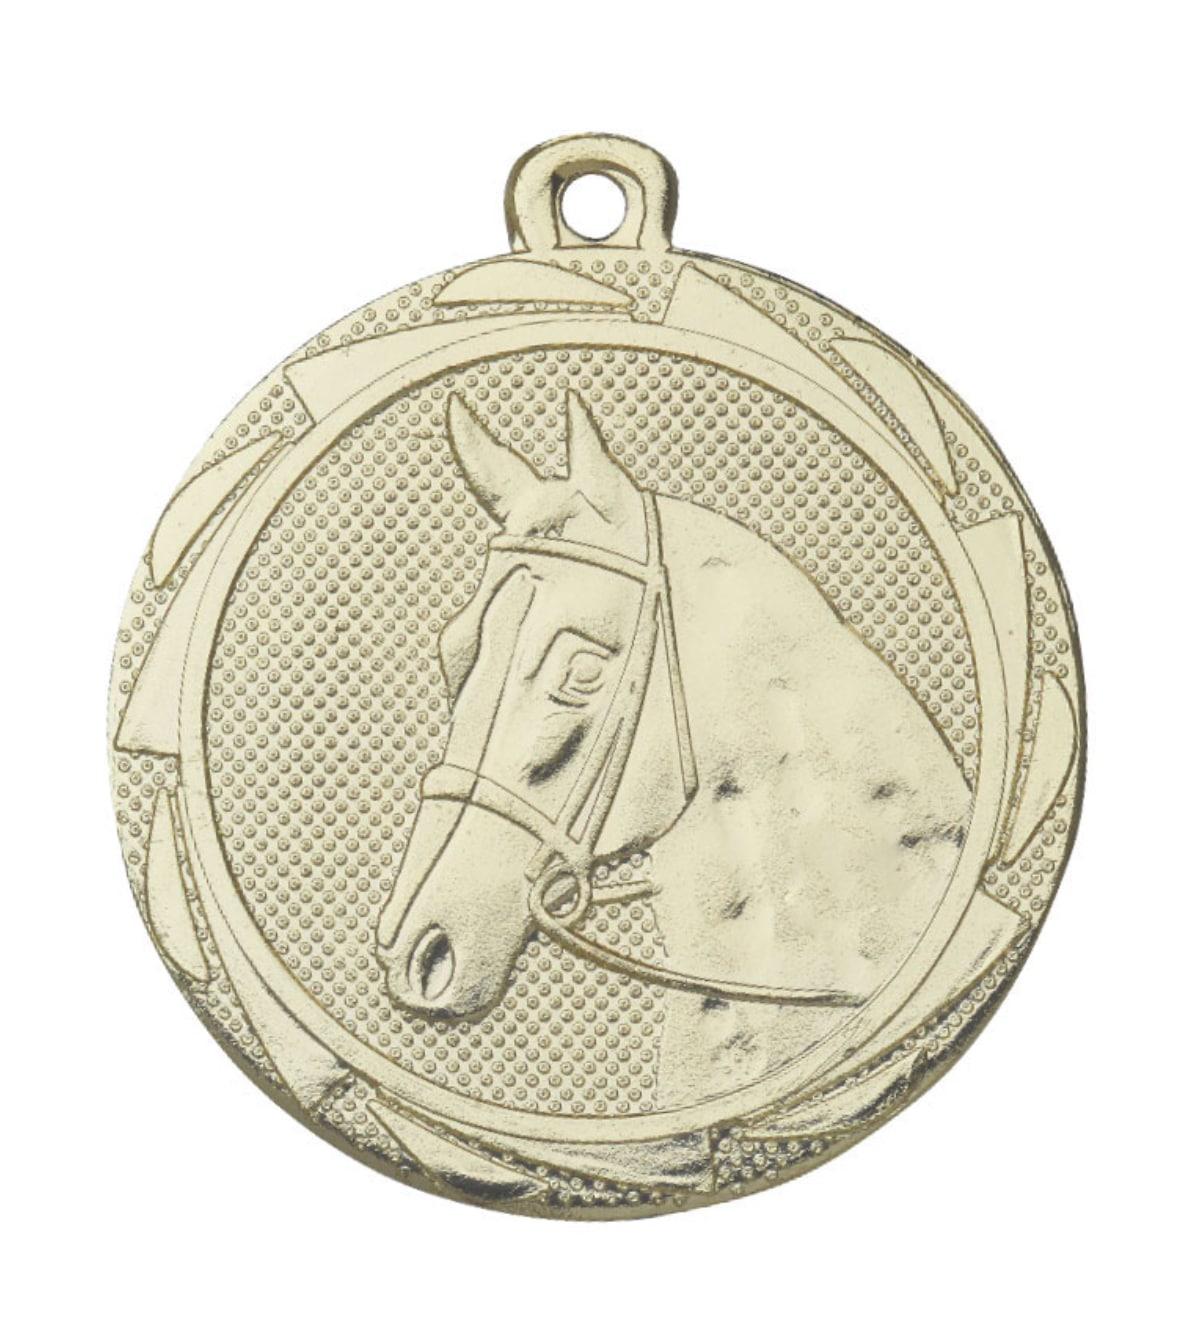 Paarden medaille